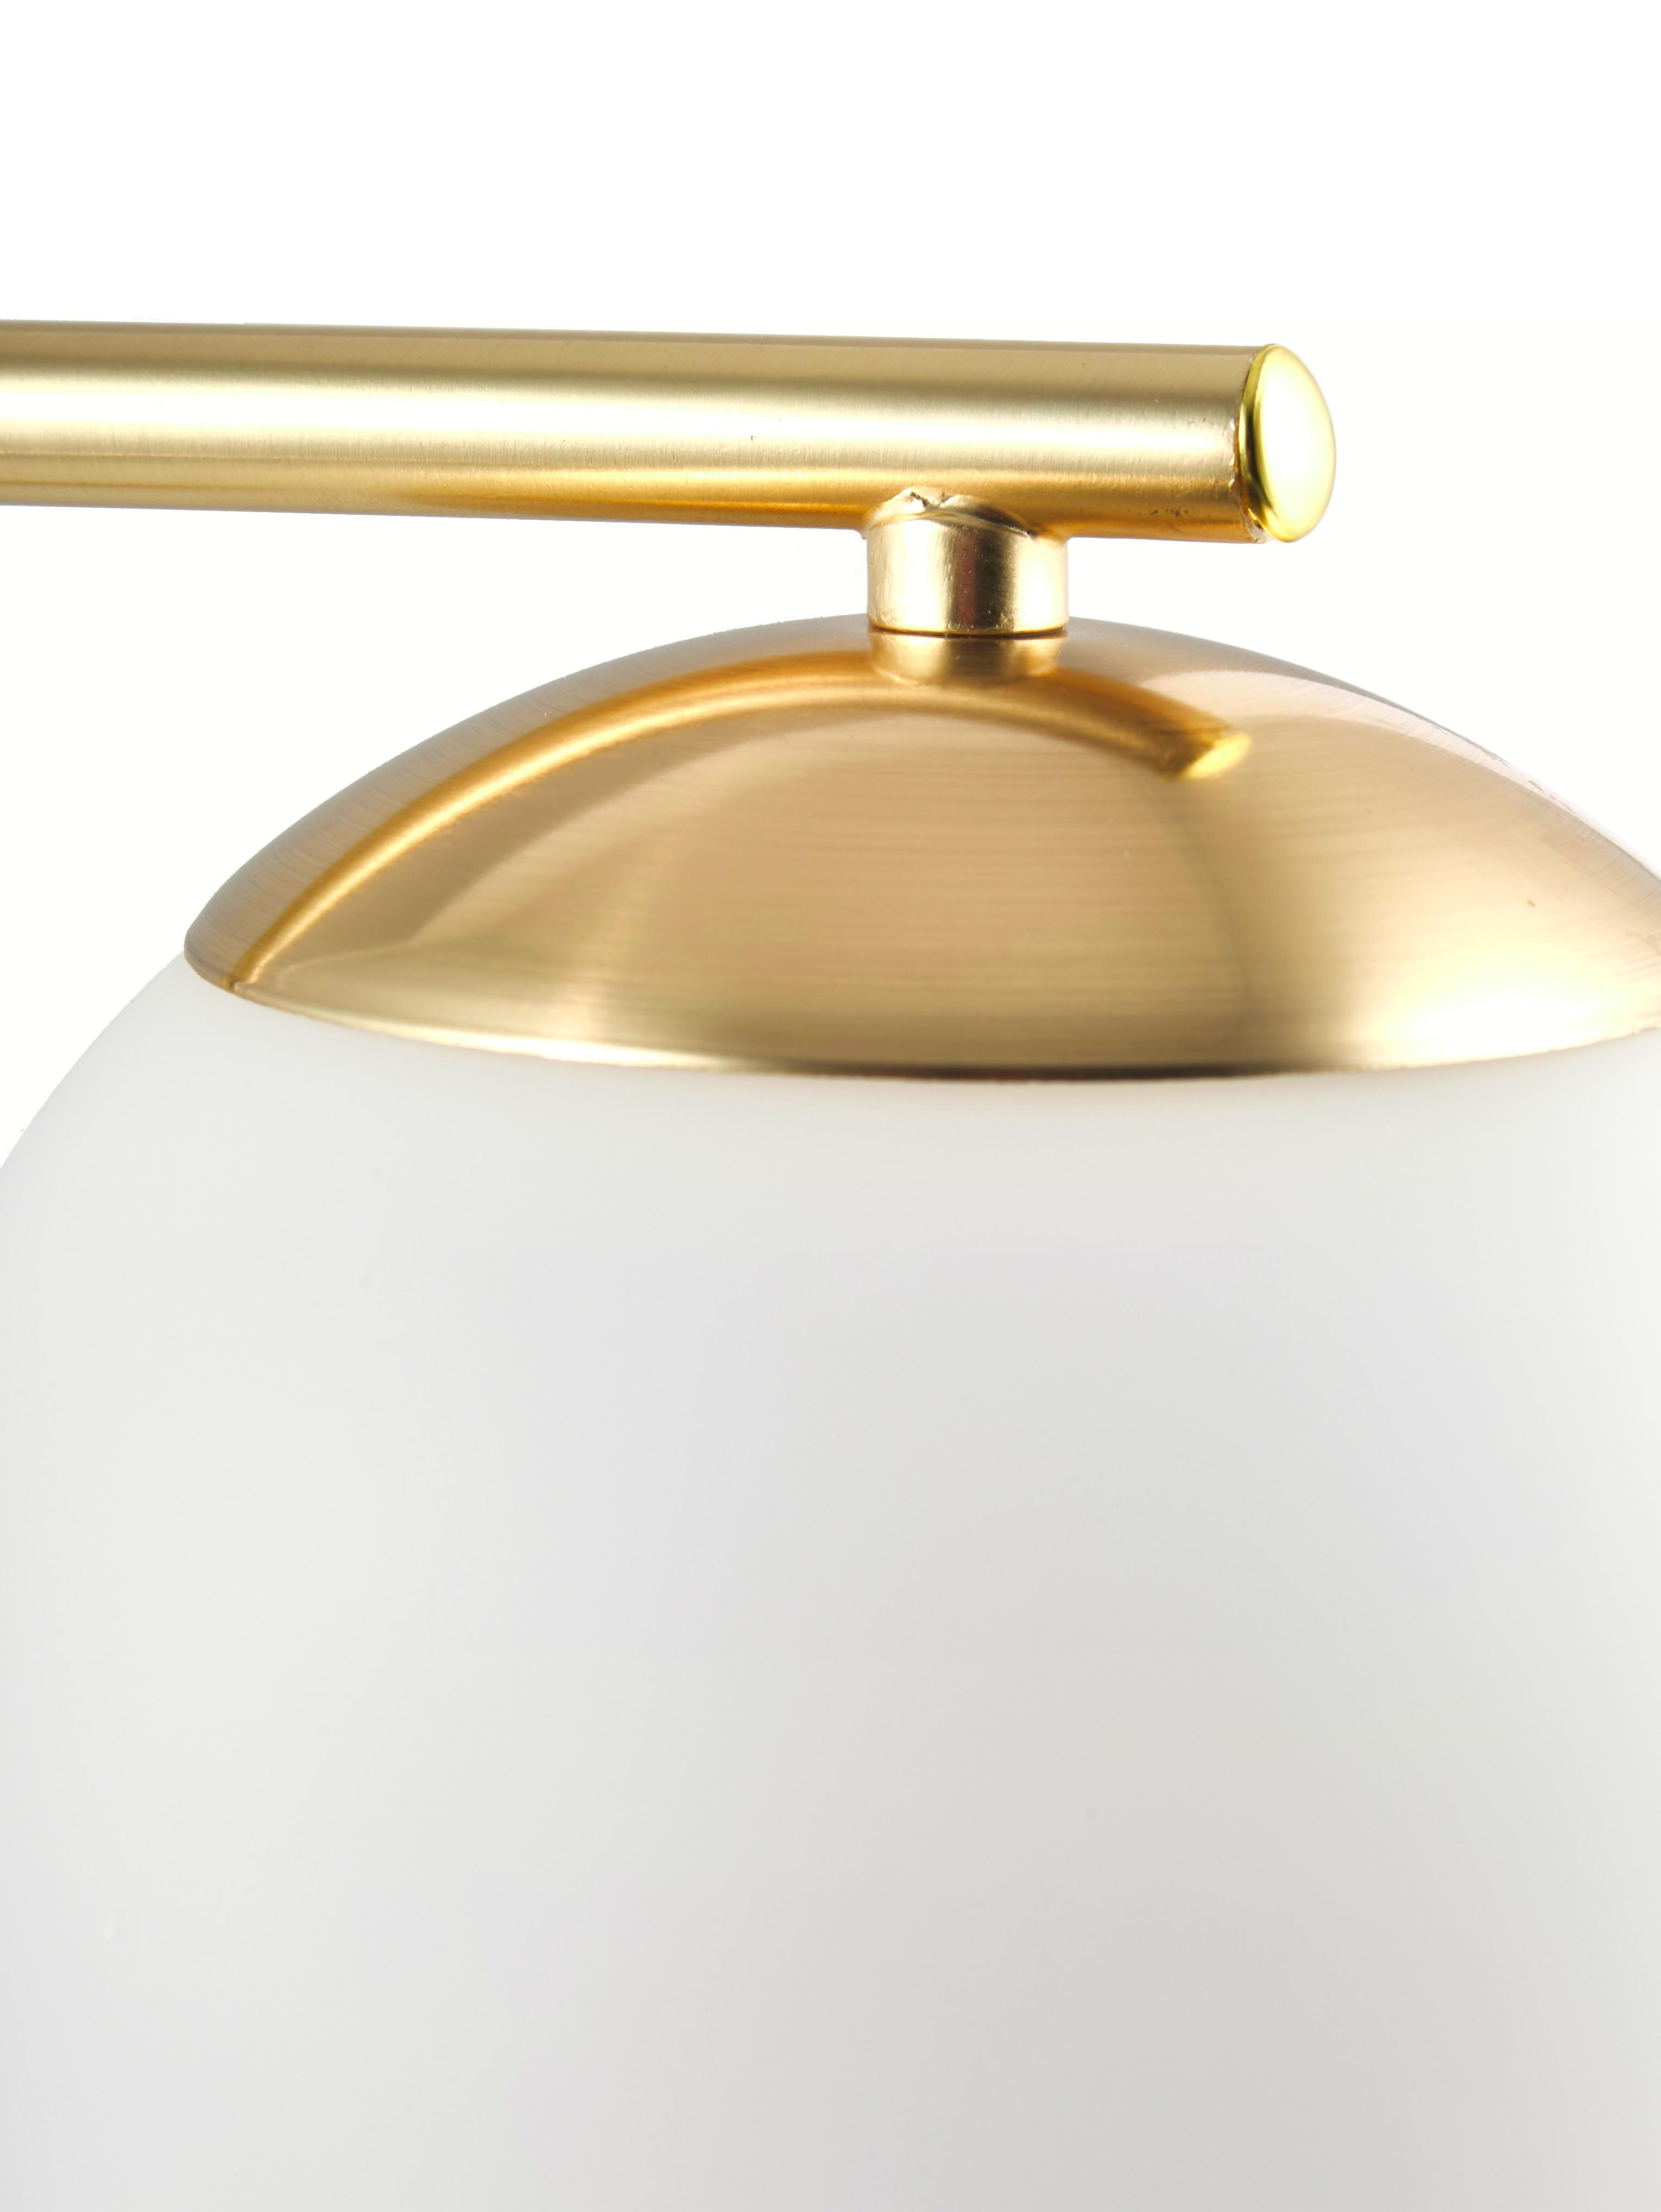 Tischlampe Grant mit Messingfuß, Lampenfuß: Messing, Lampenschirm: Opalglas, Messing, Weiß, 20 x 41 cm